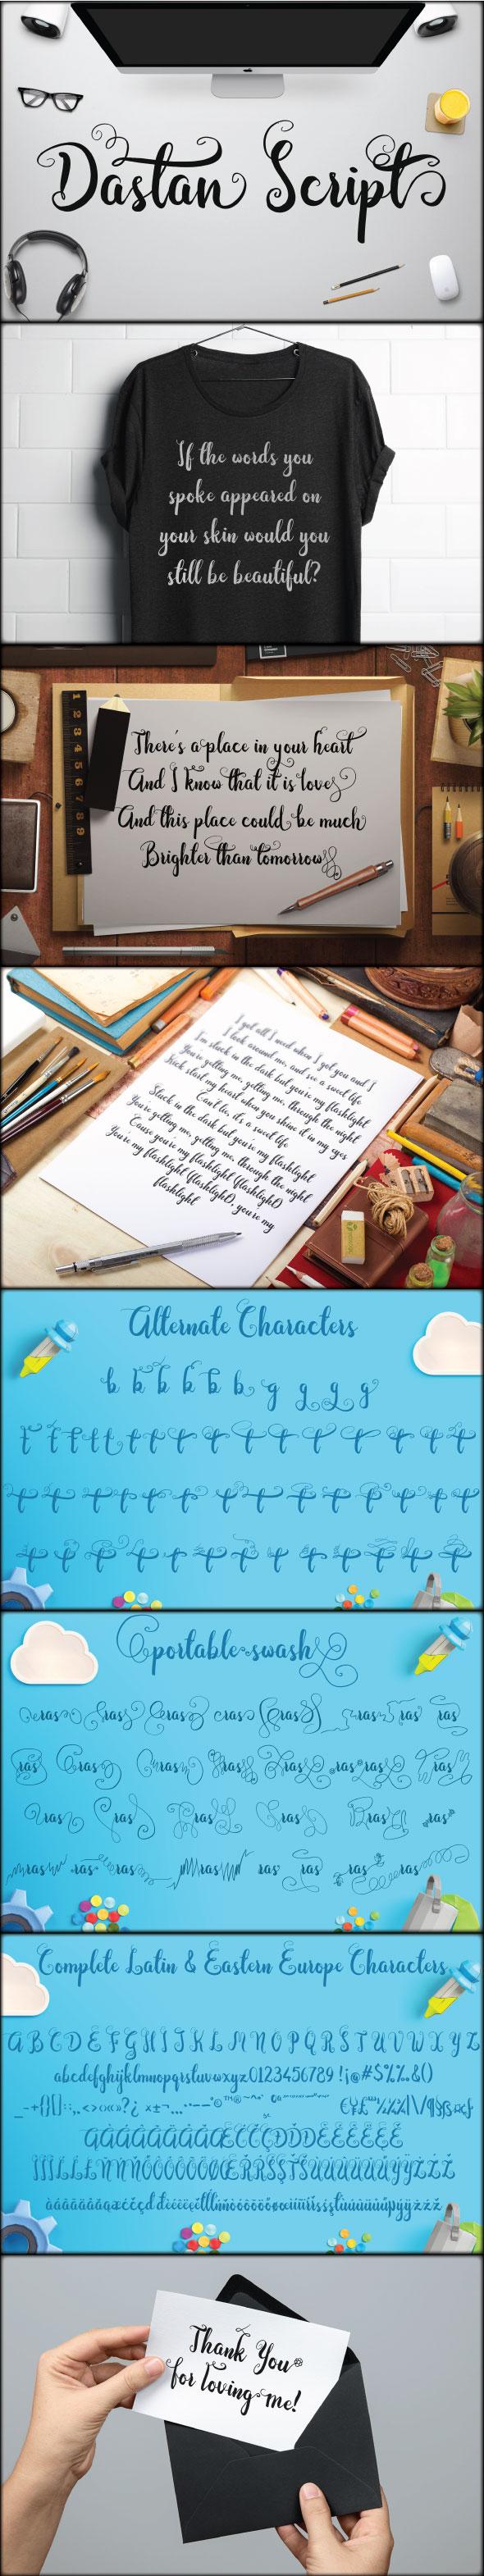 Dastan Script - Cursive Script